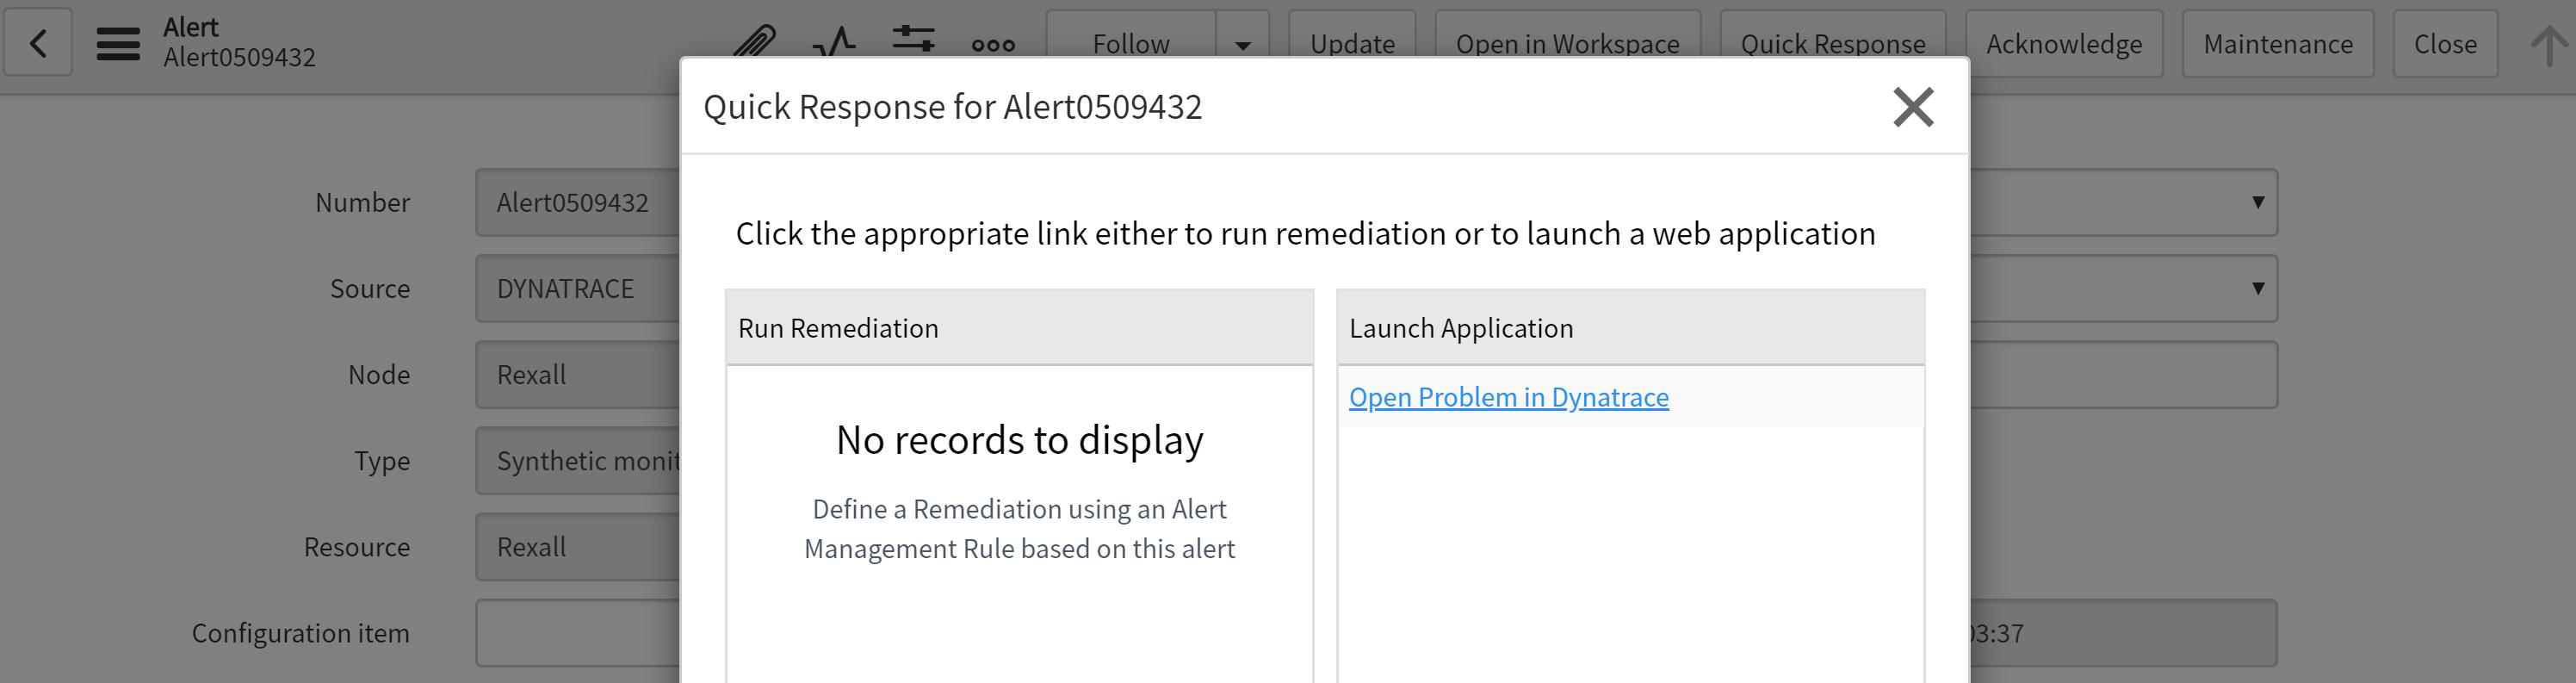 Open Dynatrace problem from ServiceNow alert